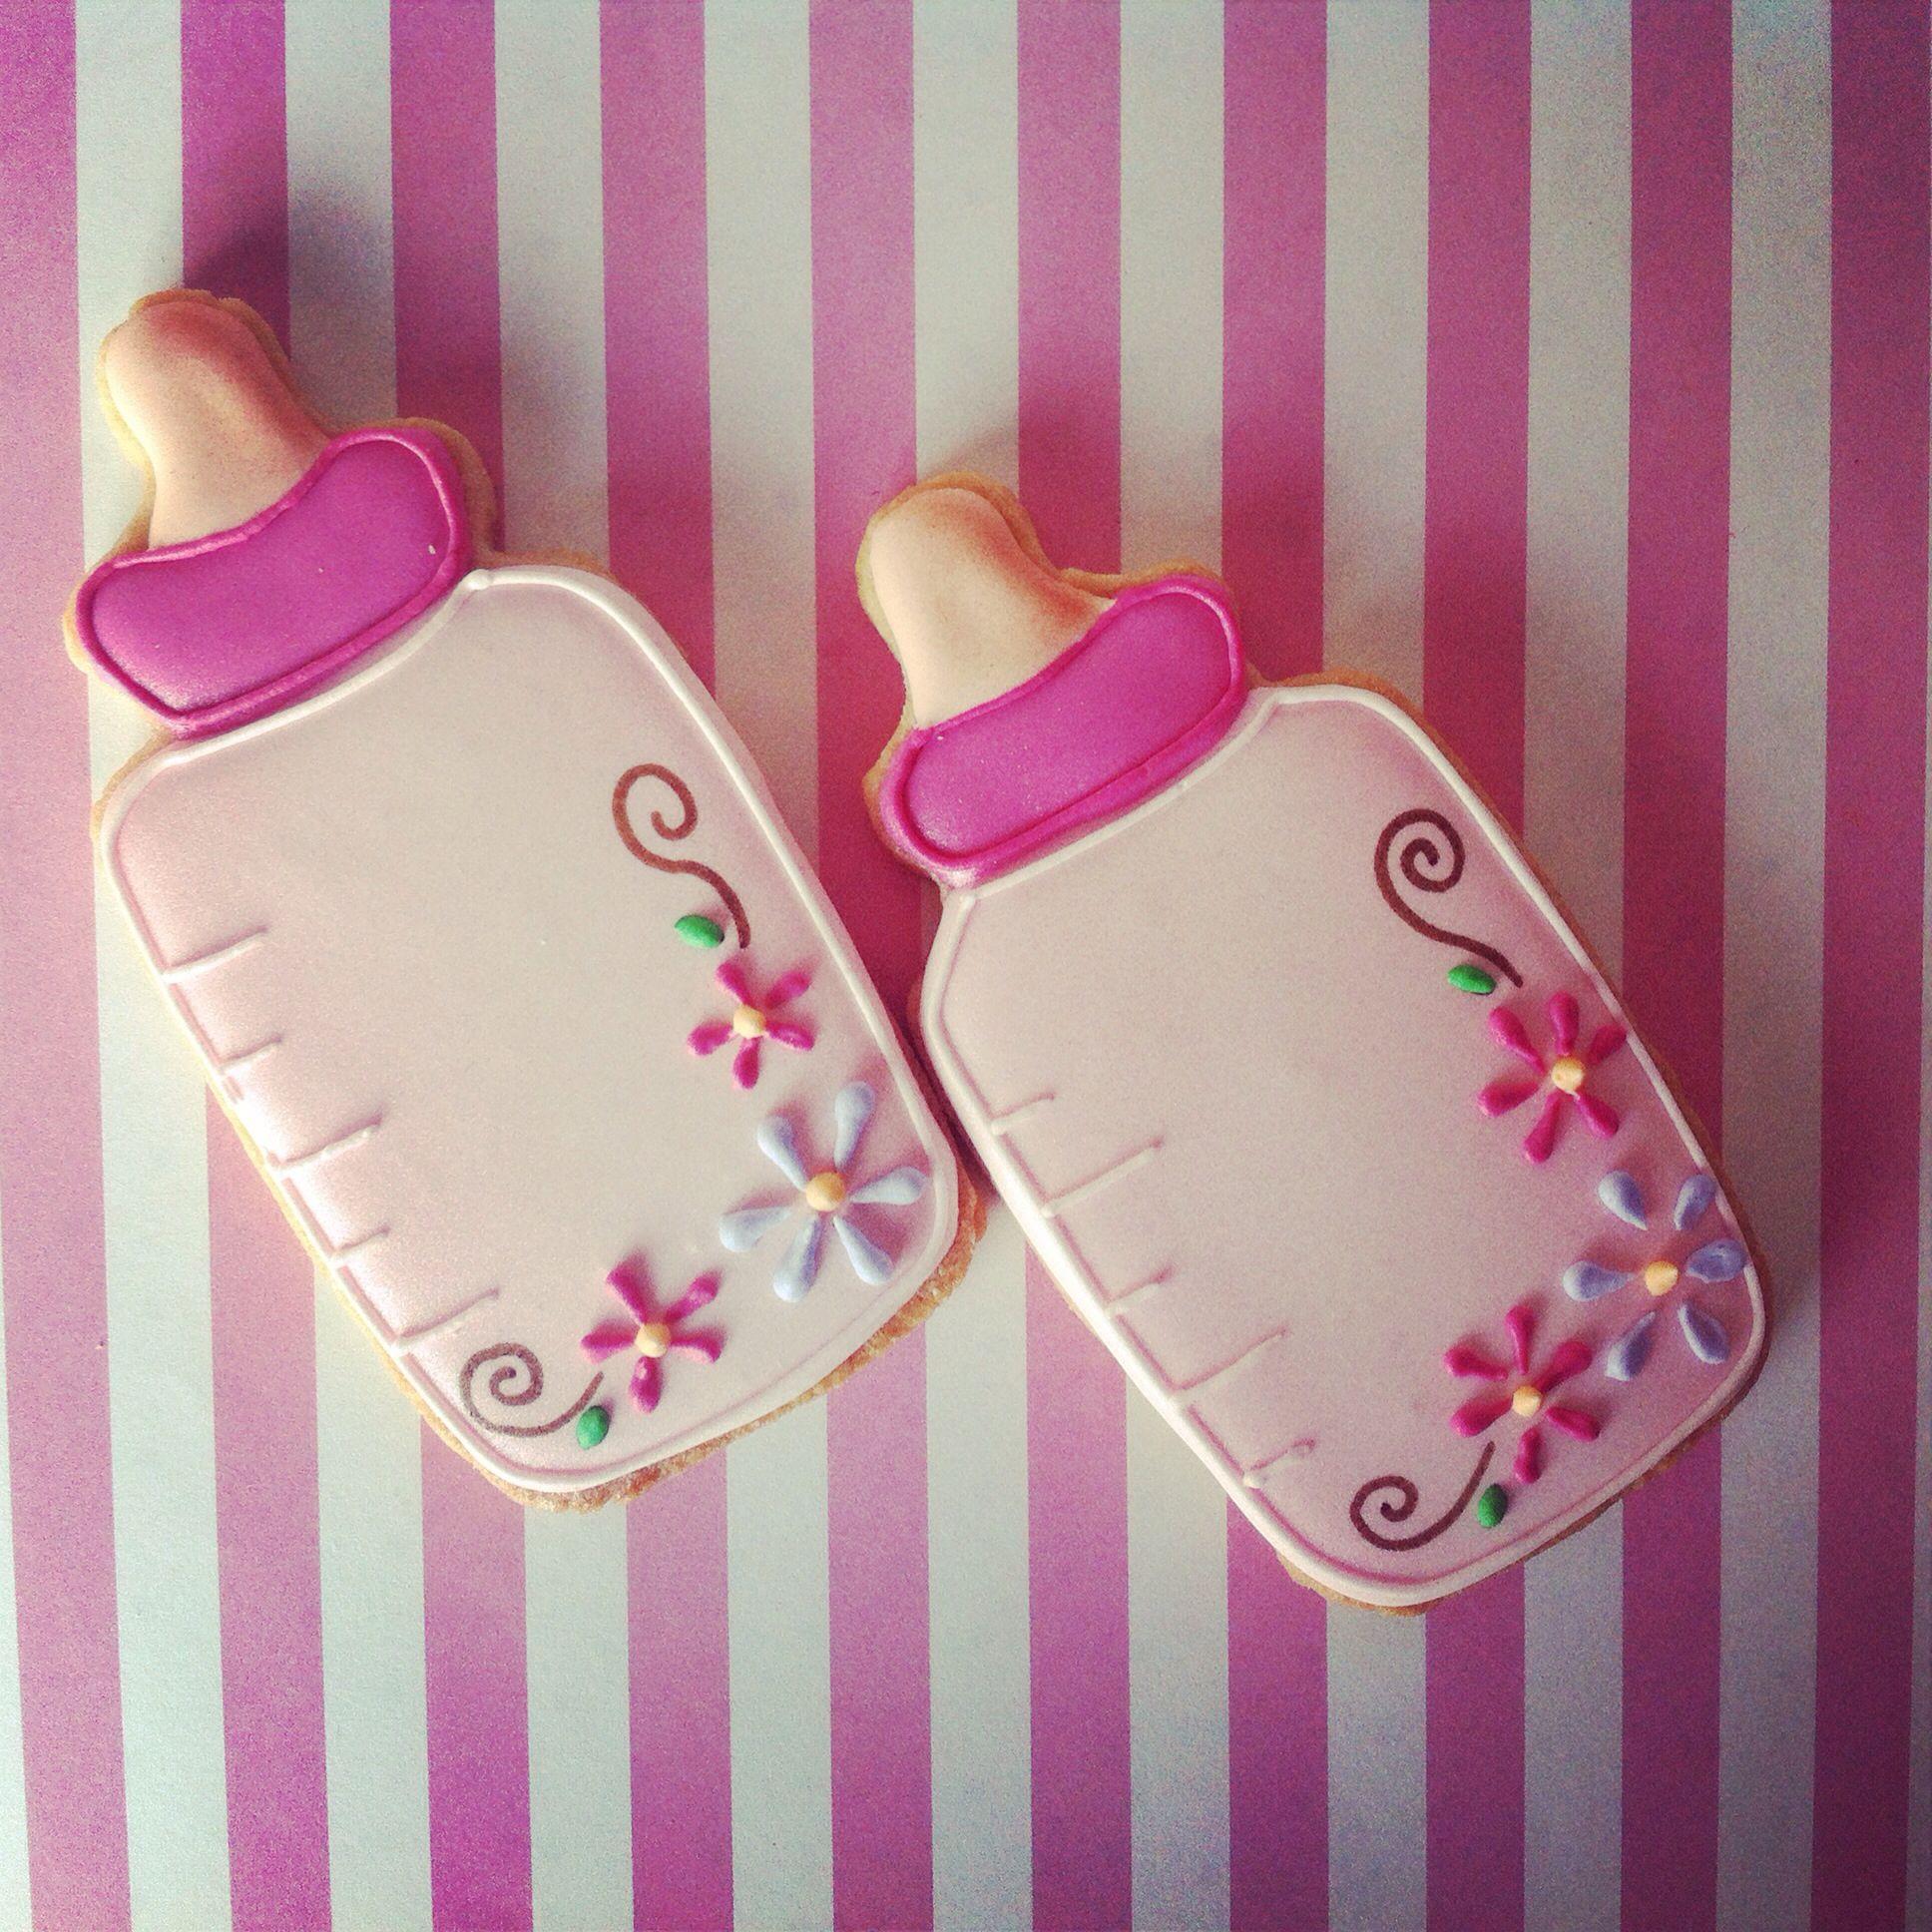 Aperitivo Para Celebraci N De Baby Shower #Babyshower #Comida